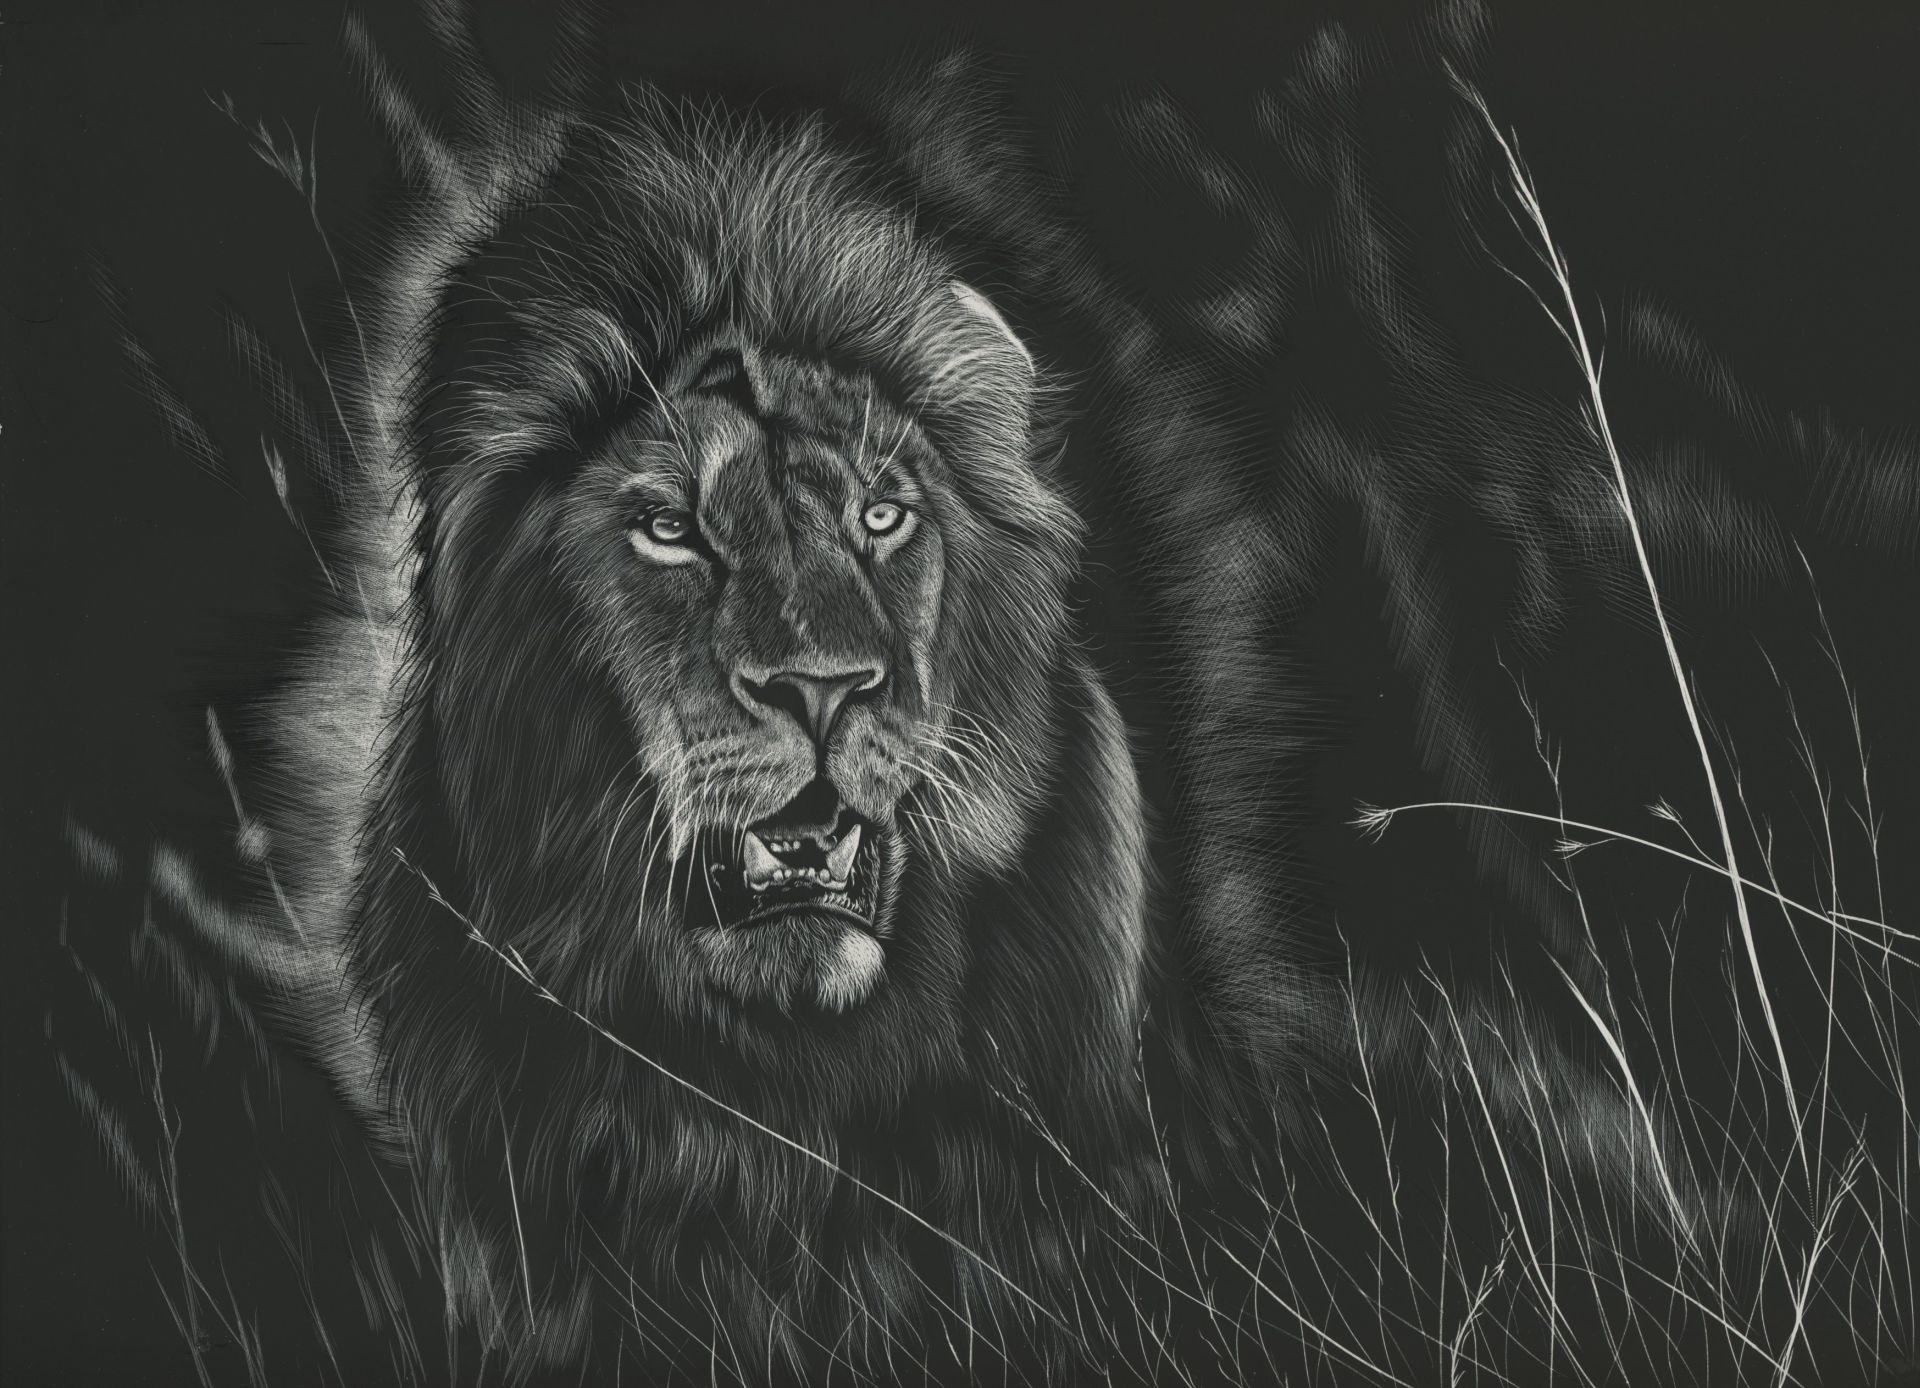 Lion Black And White Animal laptop wallpaper